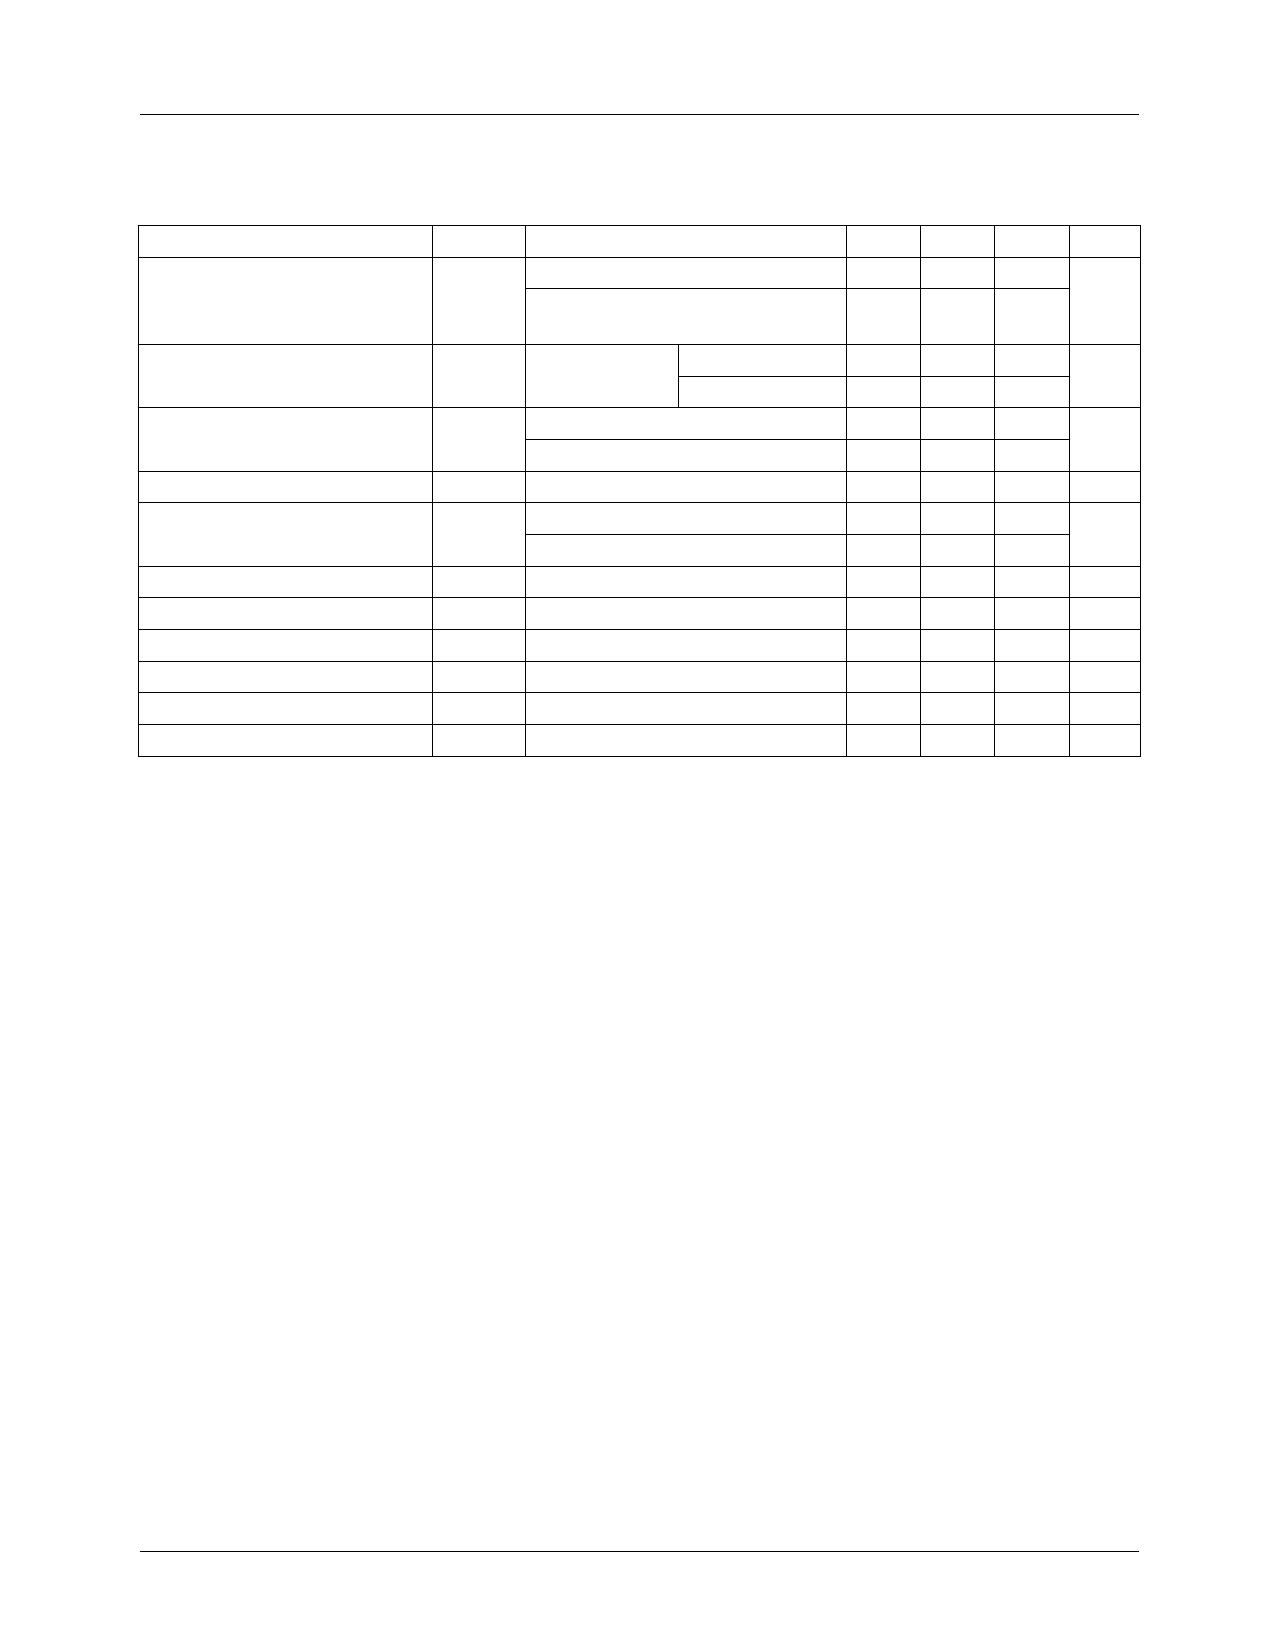 KA79XXA pdf, ピン配列